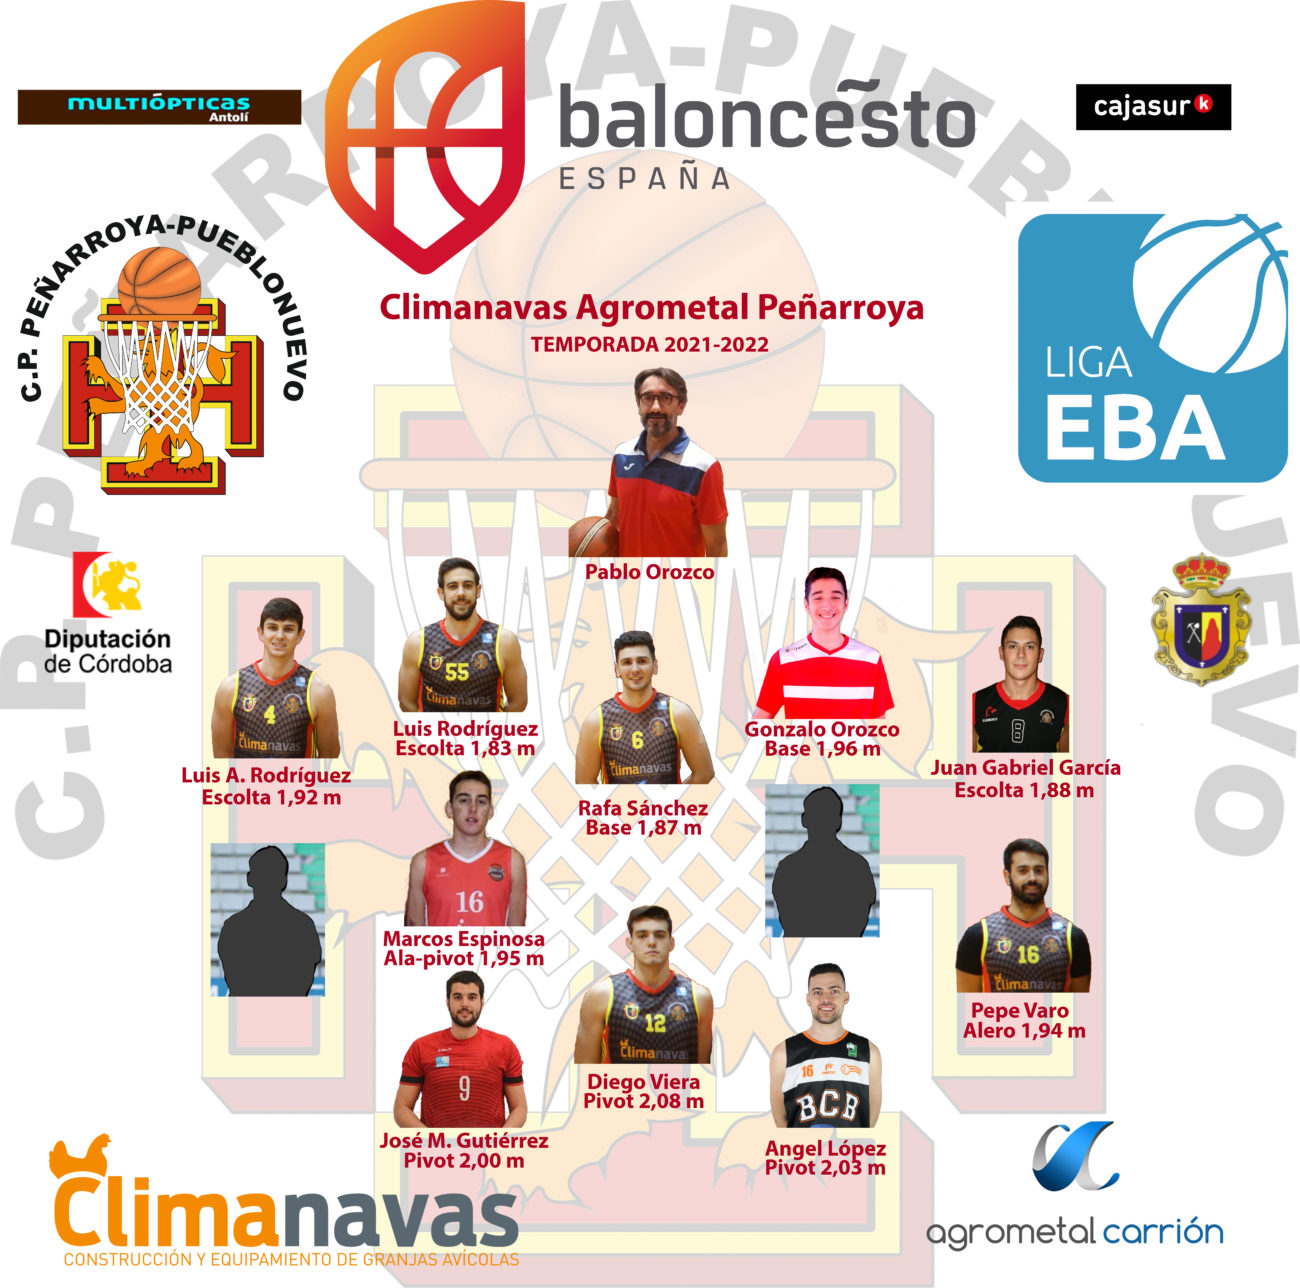 Climanavas Agrometal Peñarroya EBA 2021/22